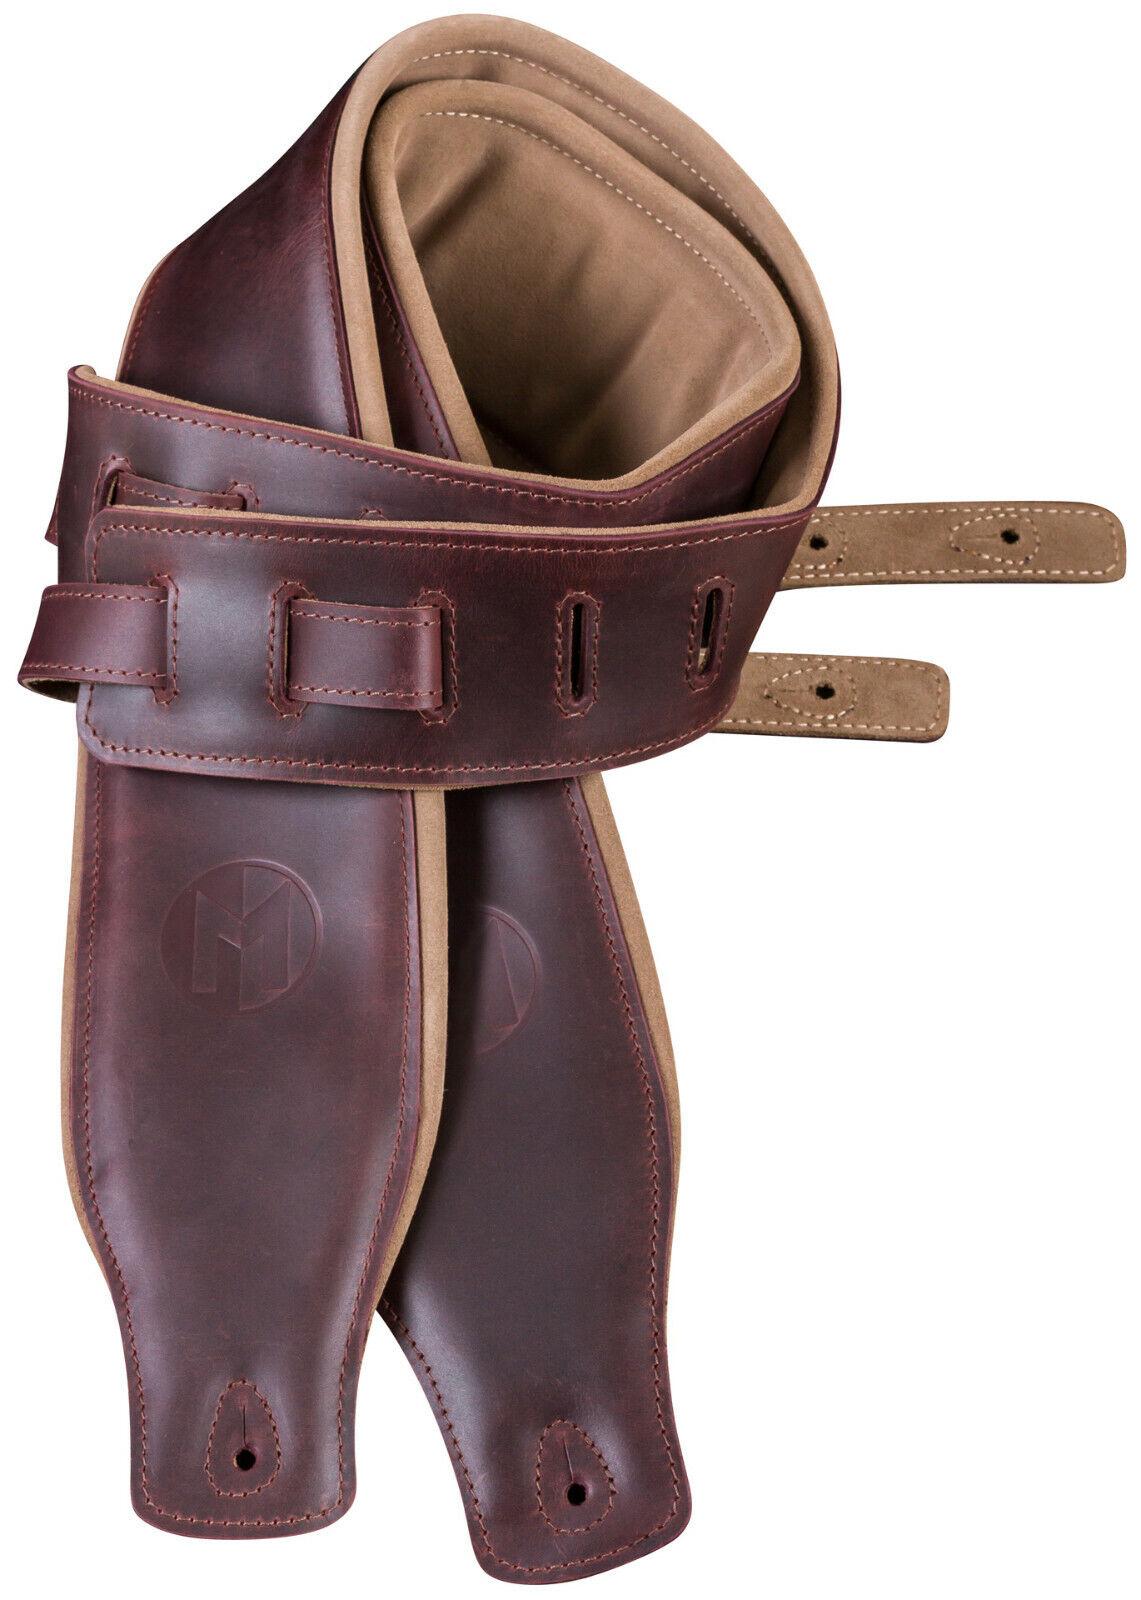 Ledergurt für Bass, Maruszczyk PES50 bordeaux, gepolstert, verstellbar,100-135cm